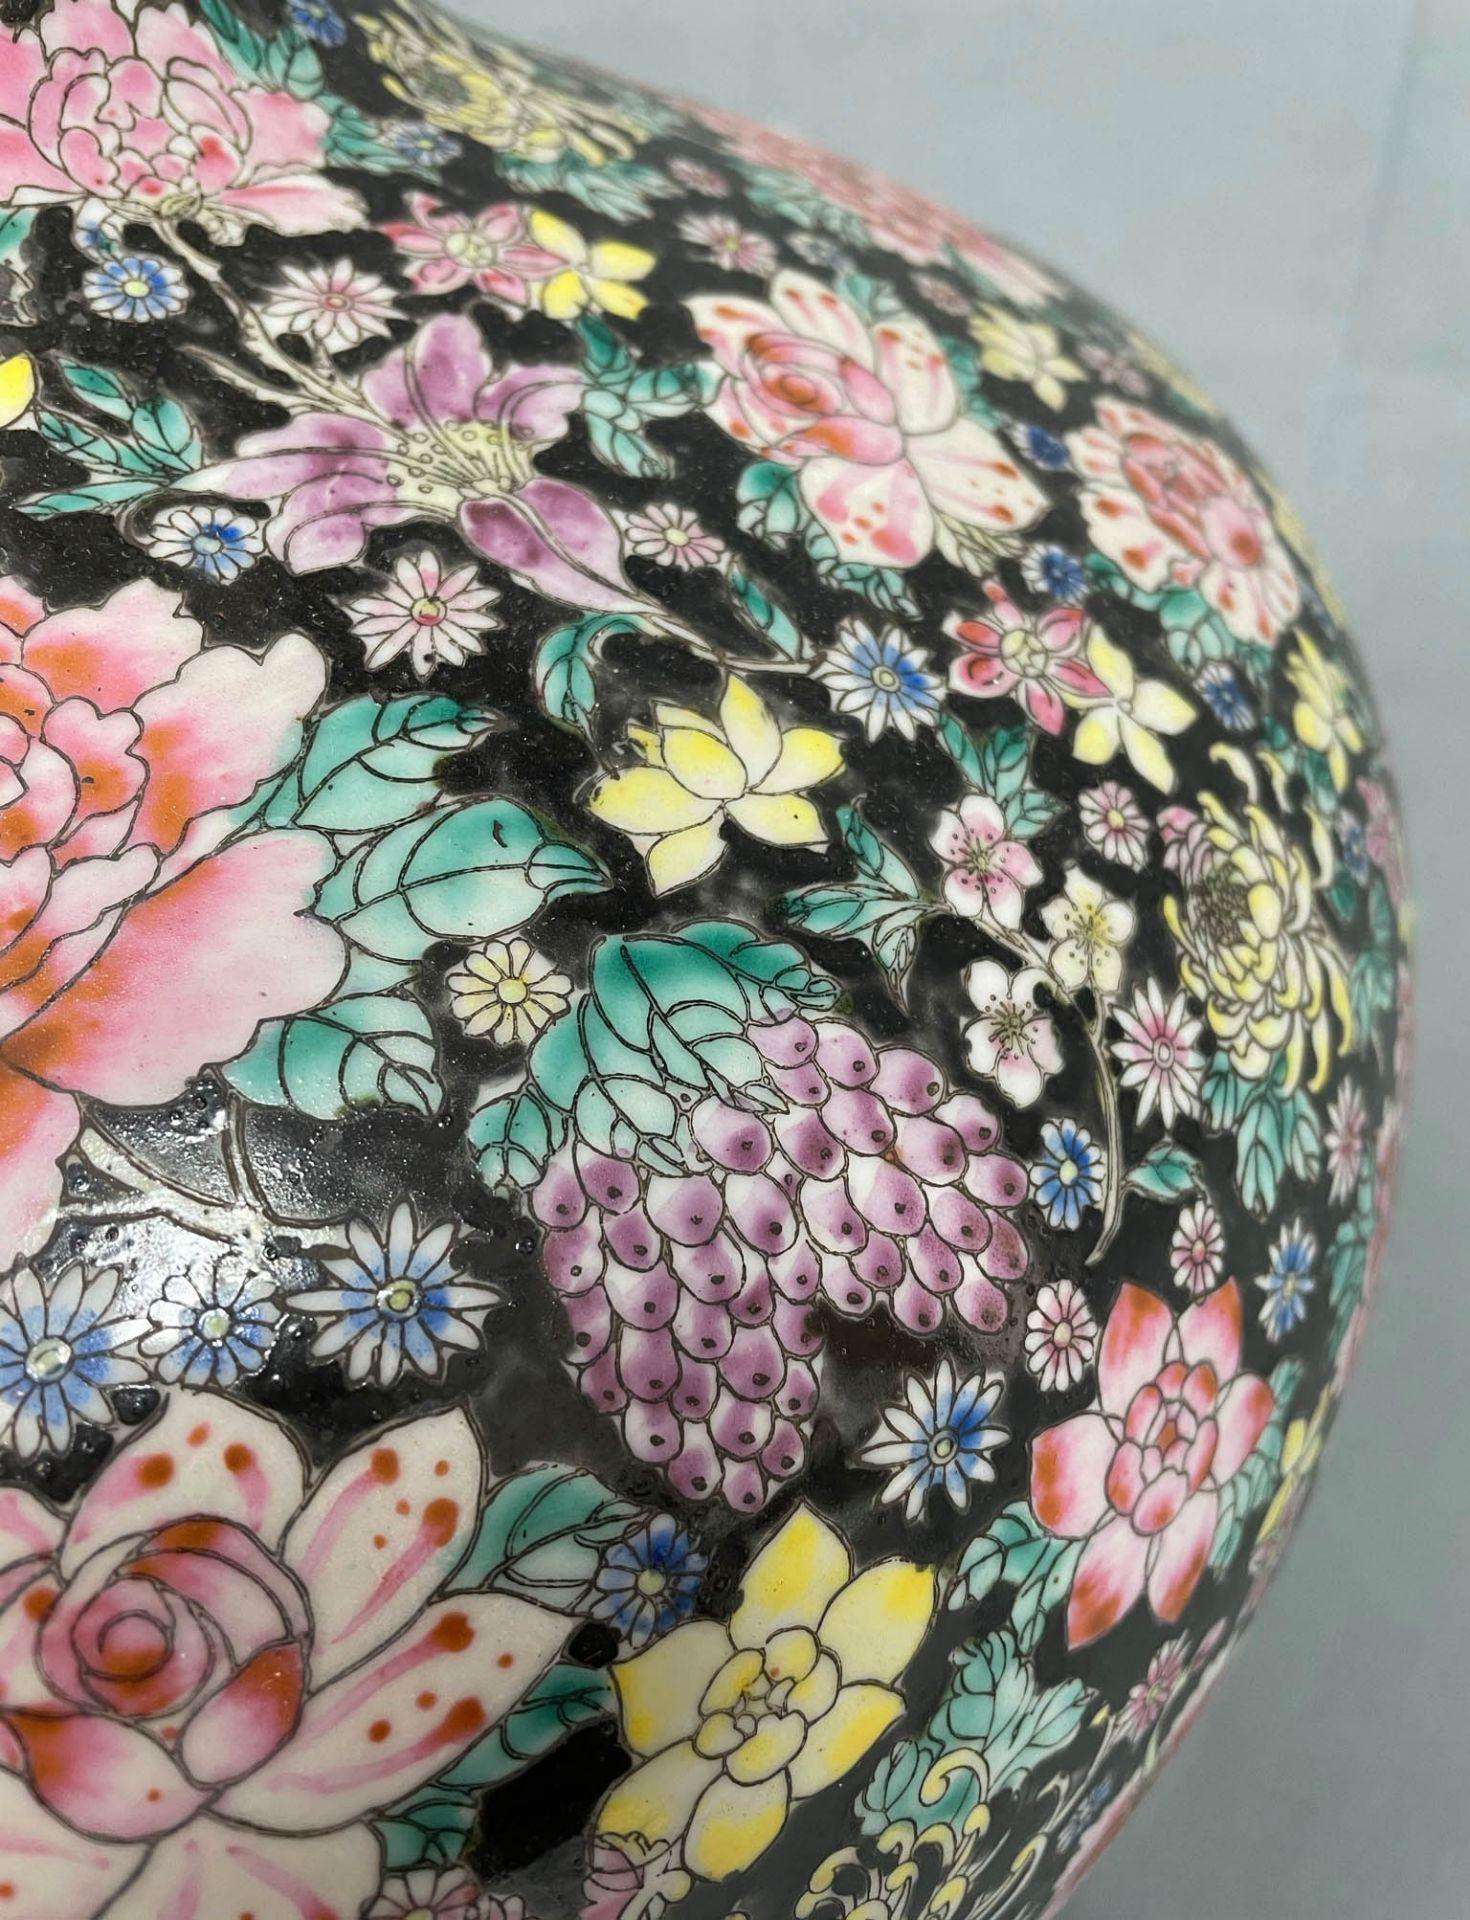 China. Porzellan. Vase. Stempelmarke circa 1930 - 1950. 53 cm hoch. - Image 10 of 20